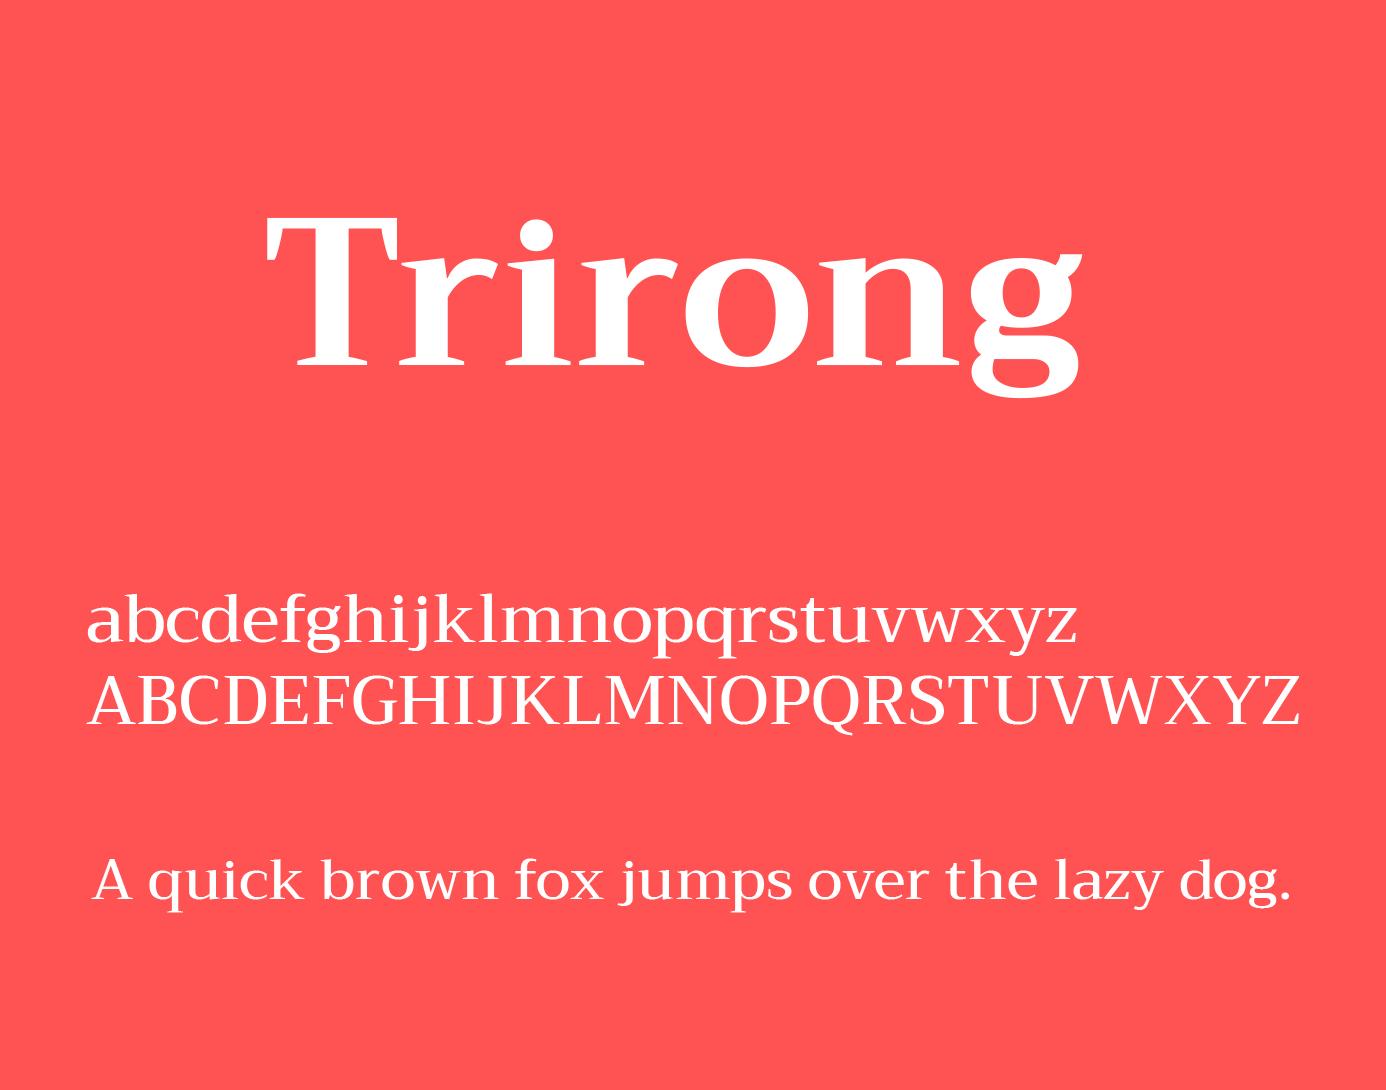 trirong-font